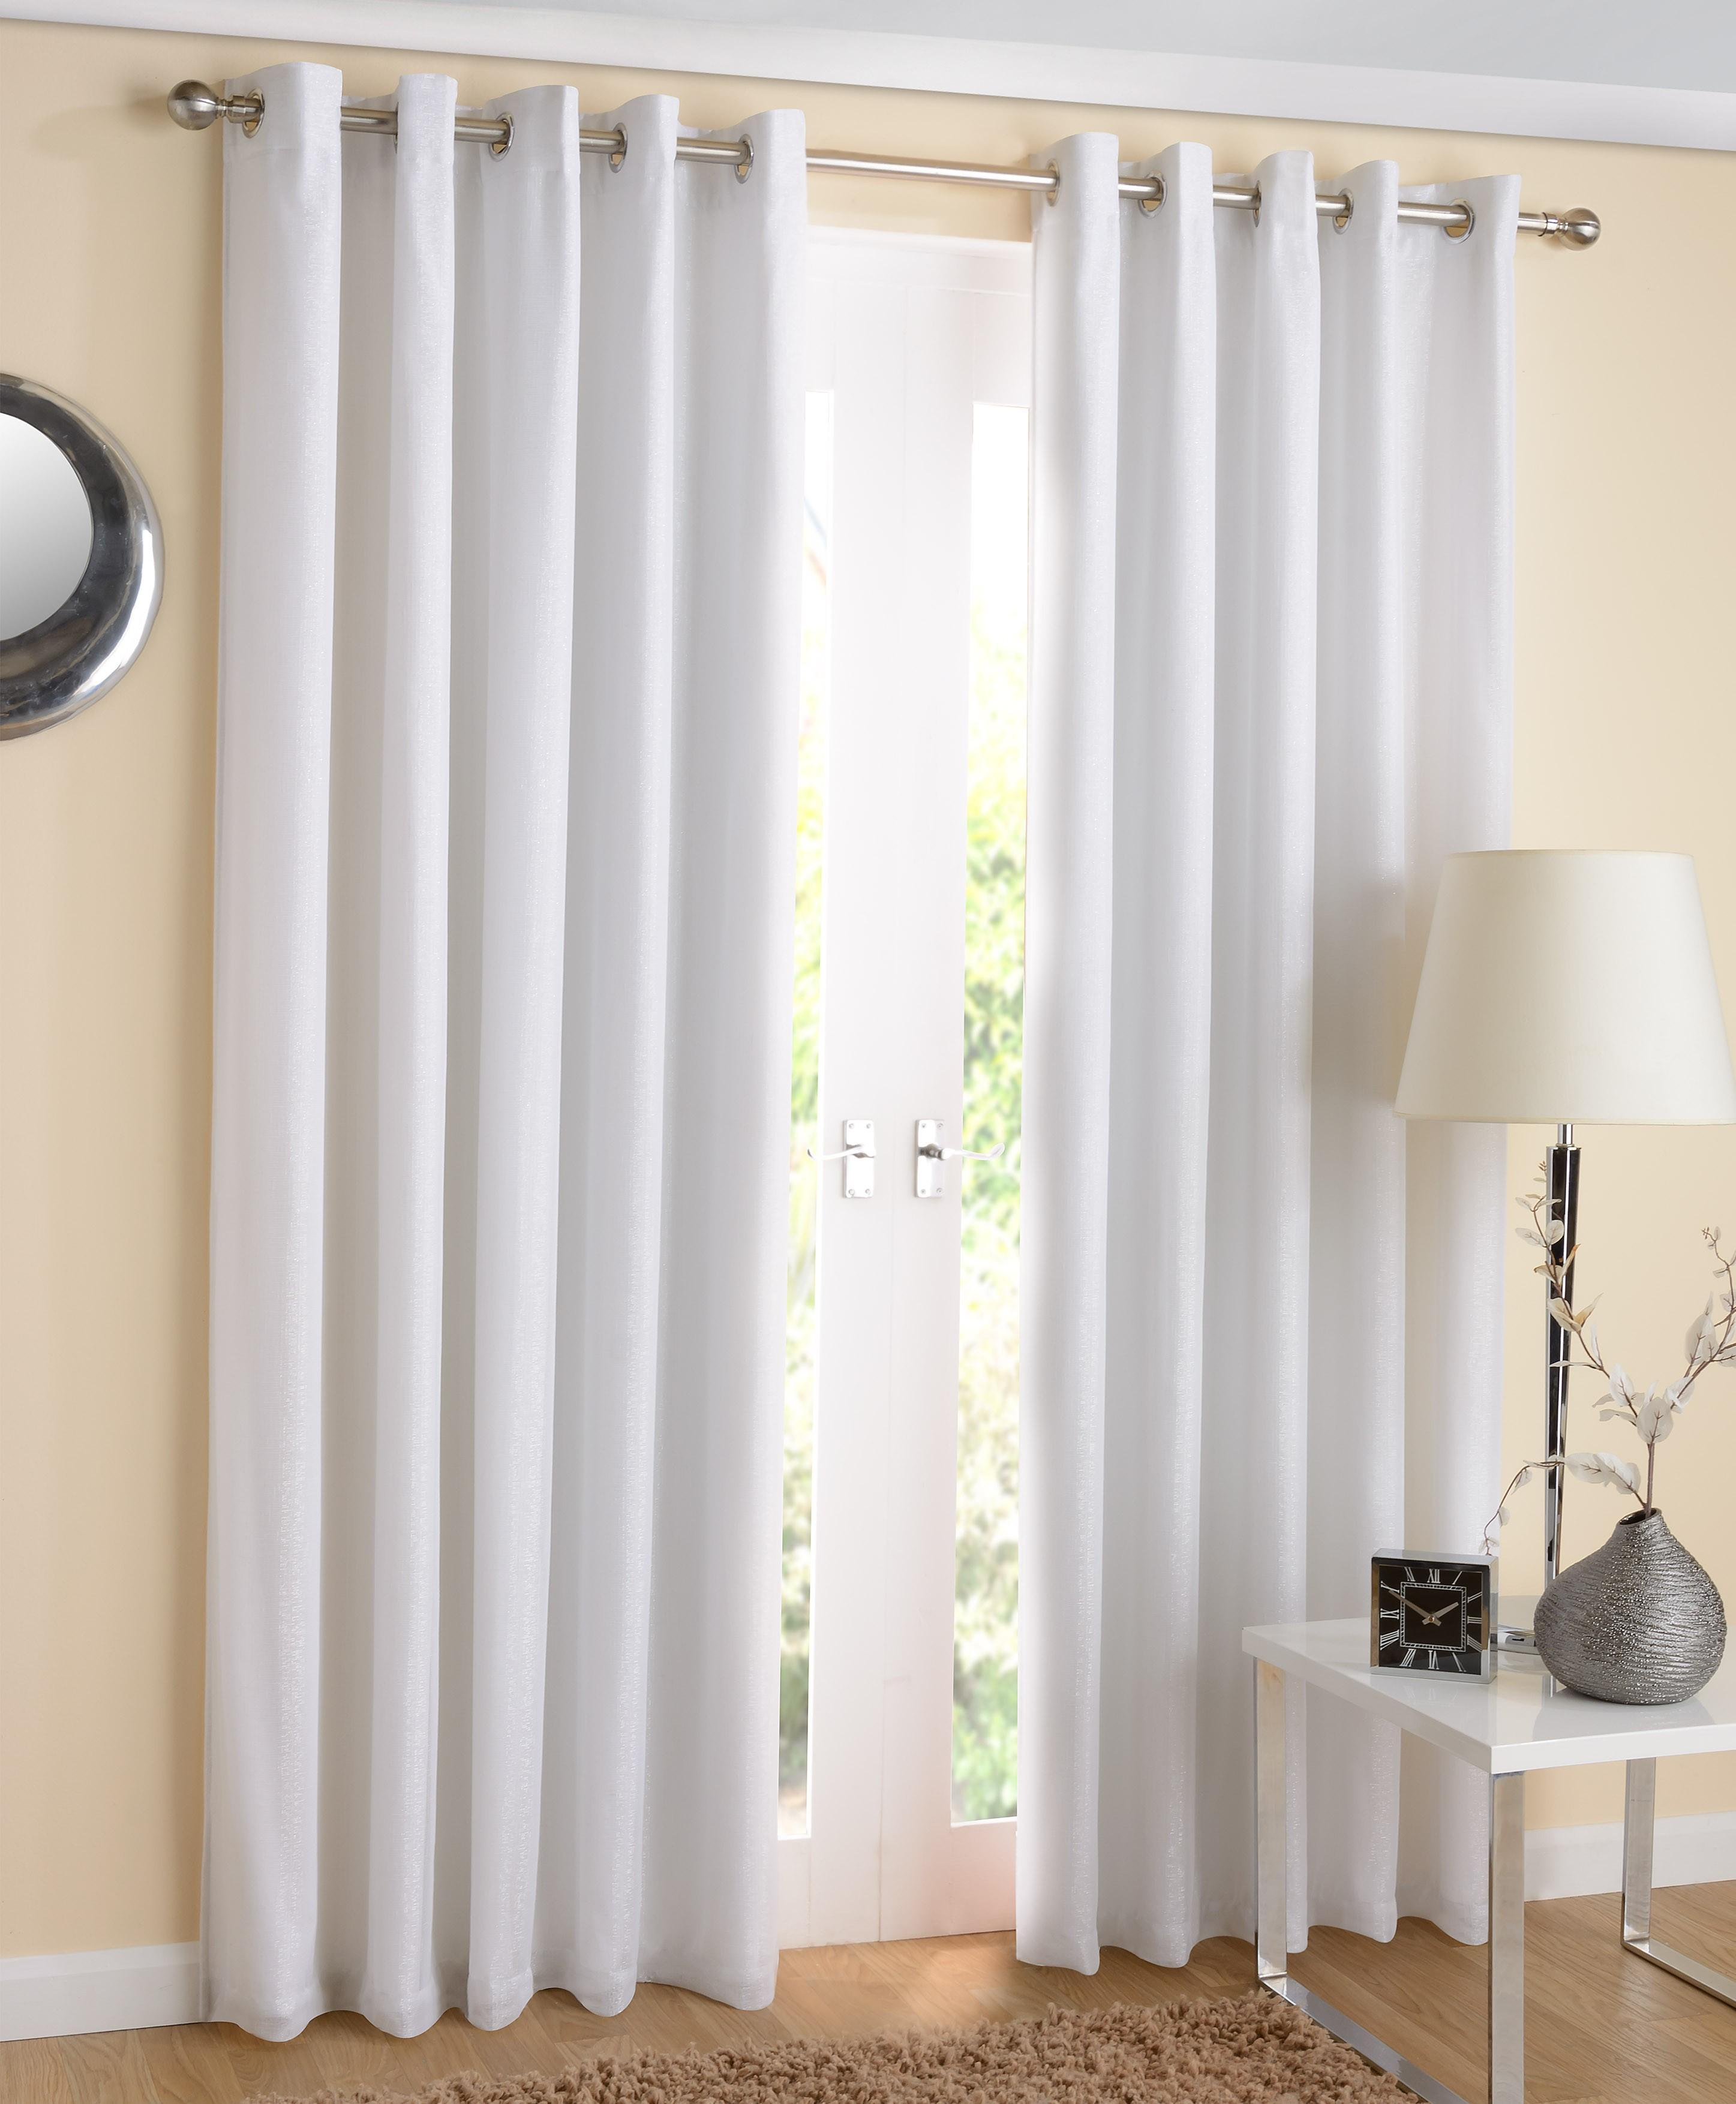 Orange Lined Voile Curtains Curtain Menzilperde Net